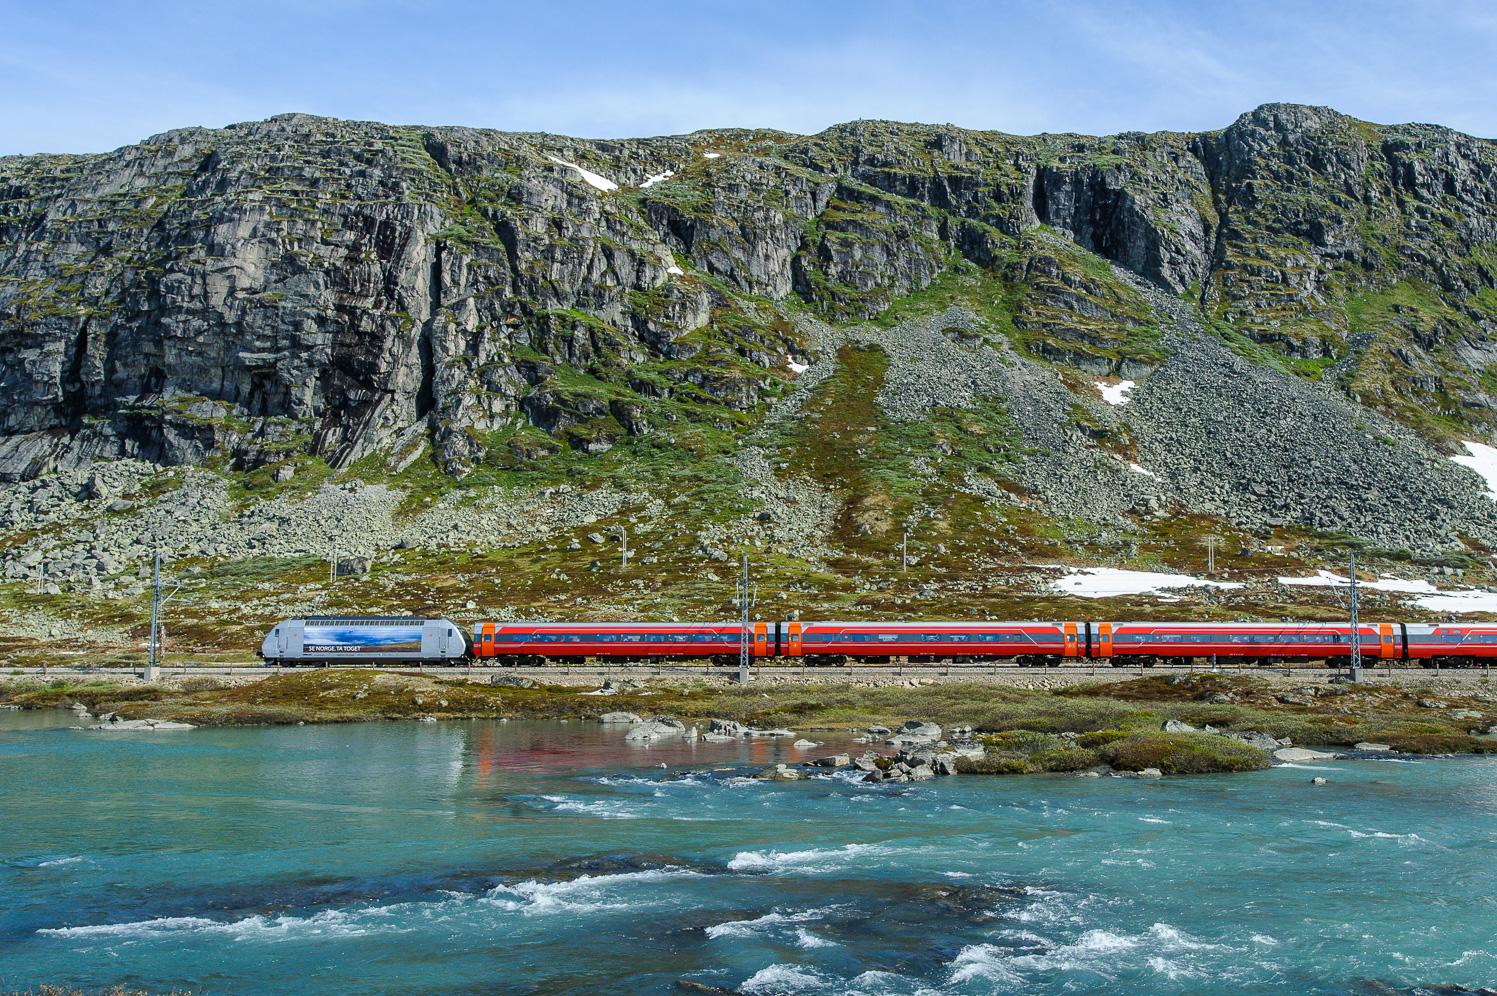 Train 609 by Oksabotn